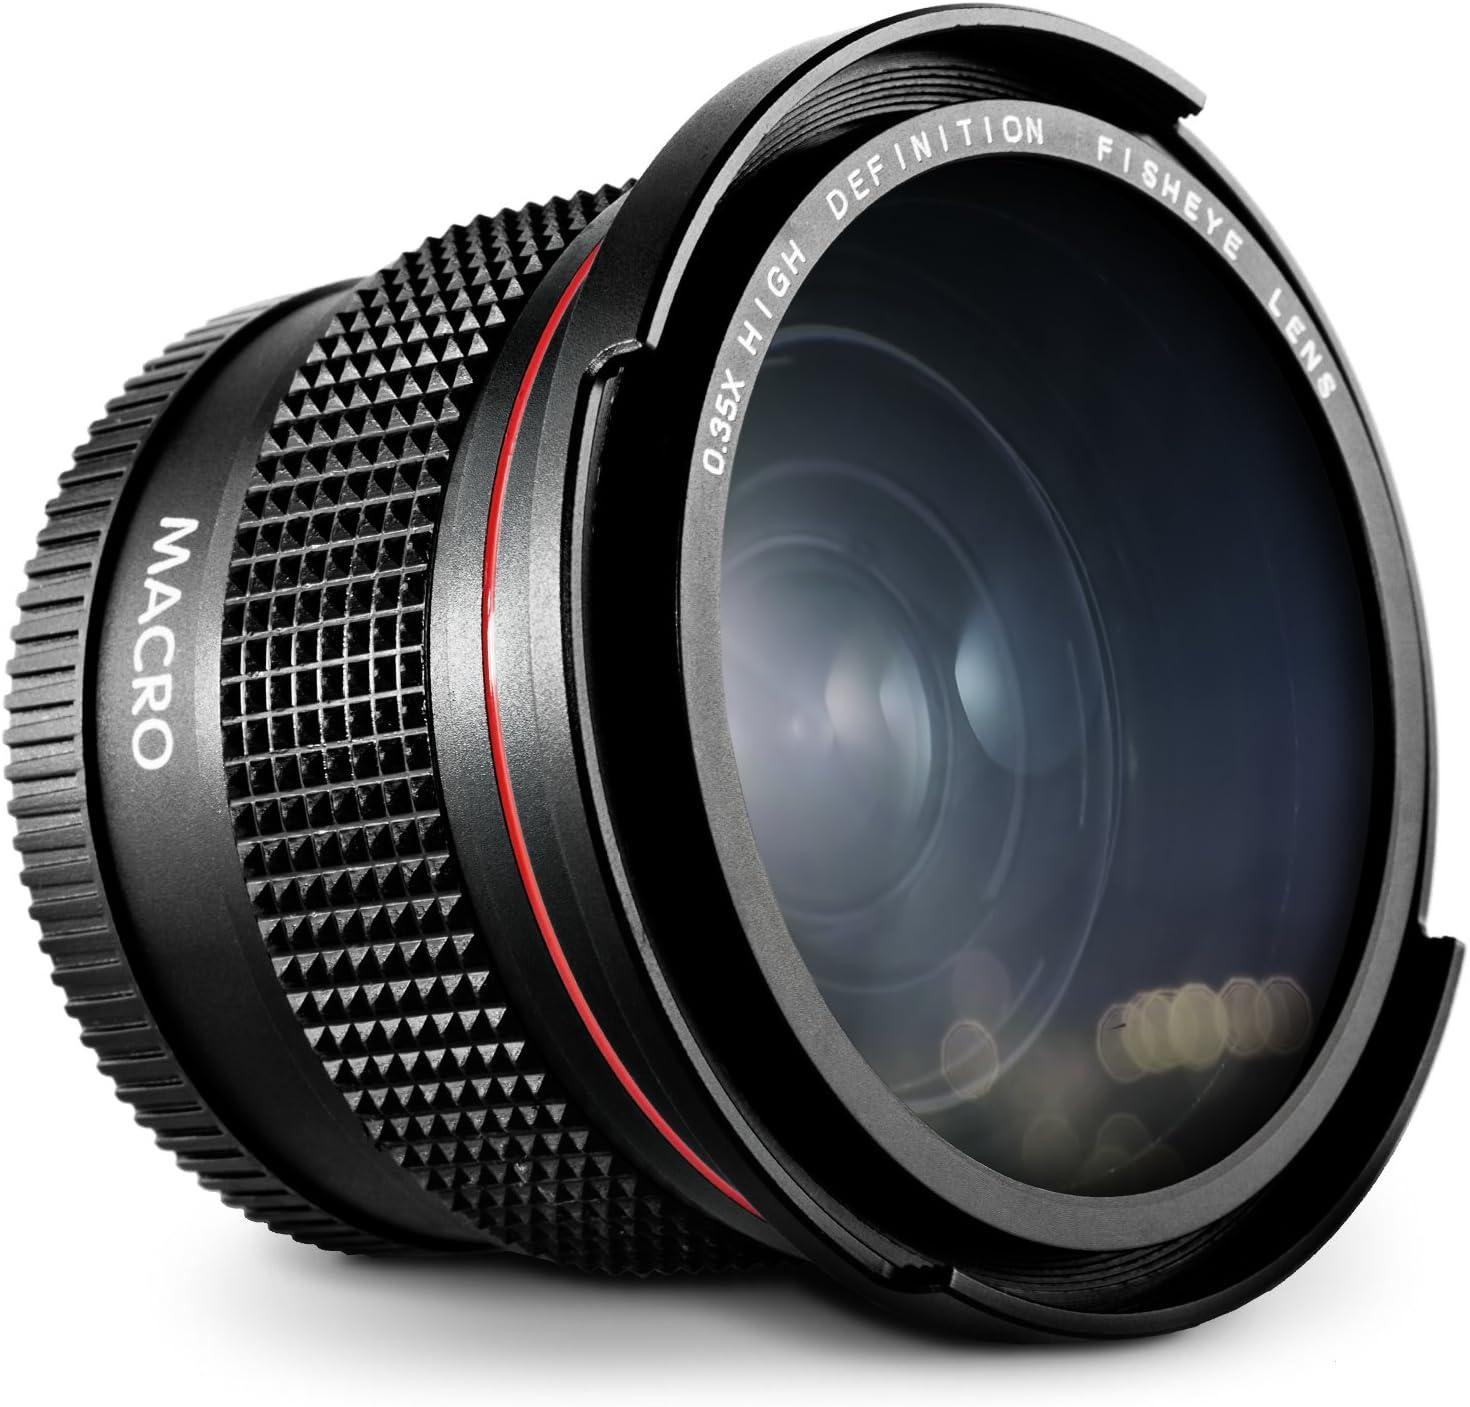 Lente 52MM 0.35x Ojo de Pez con Macro para Nikon DSLR